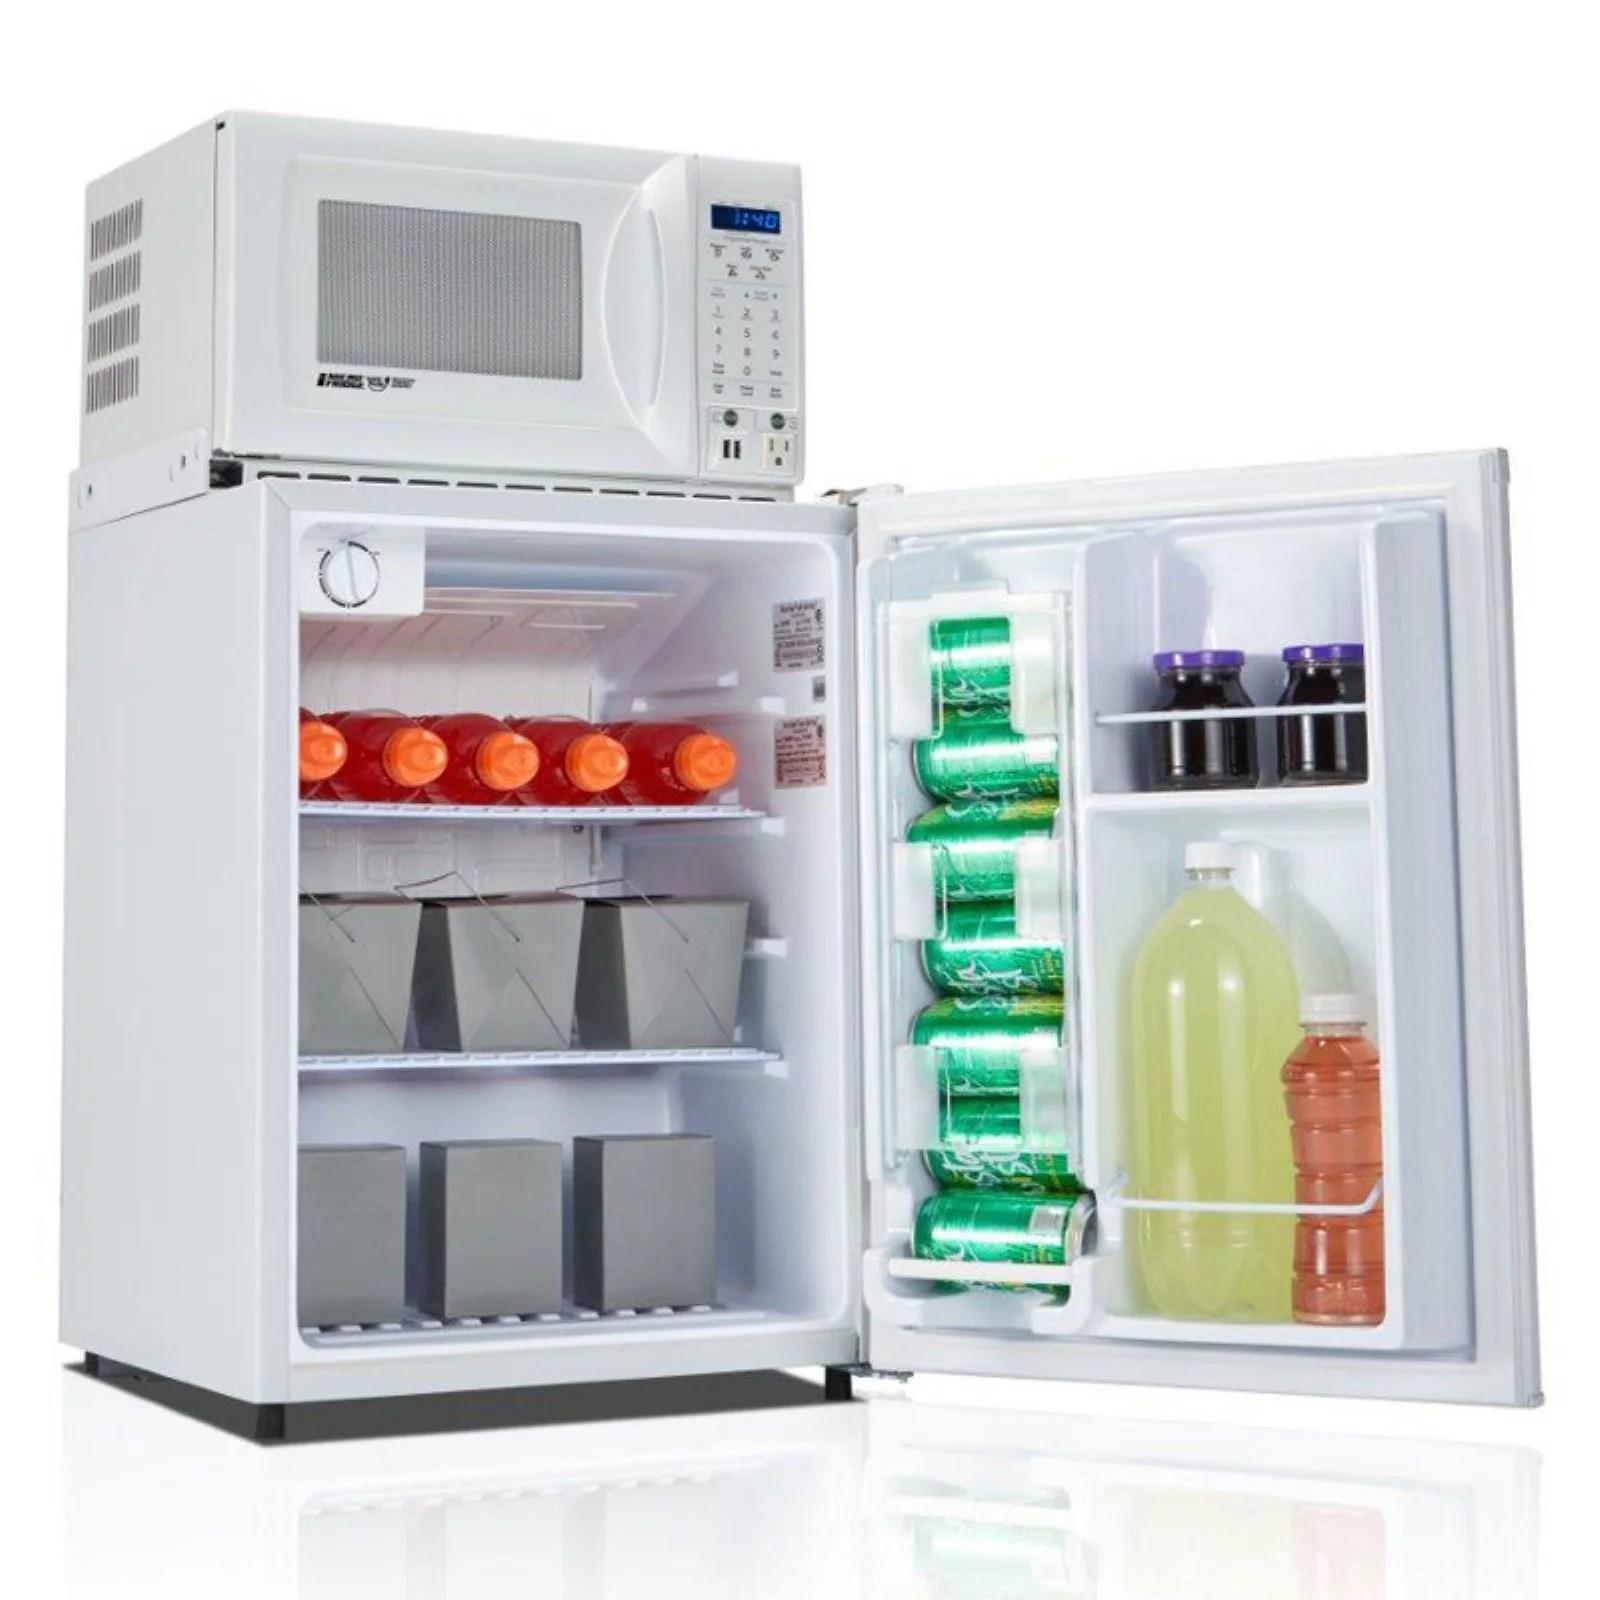 microfridge all refrigerator microwave combo appliance black 2 3 cu ft